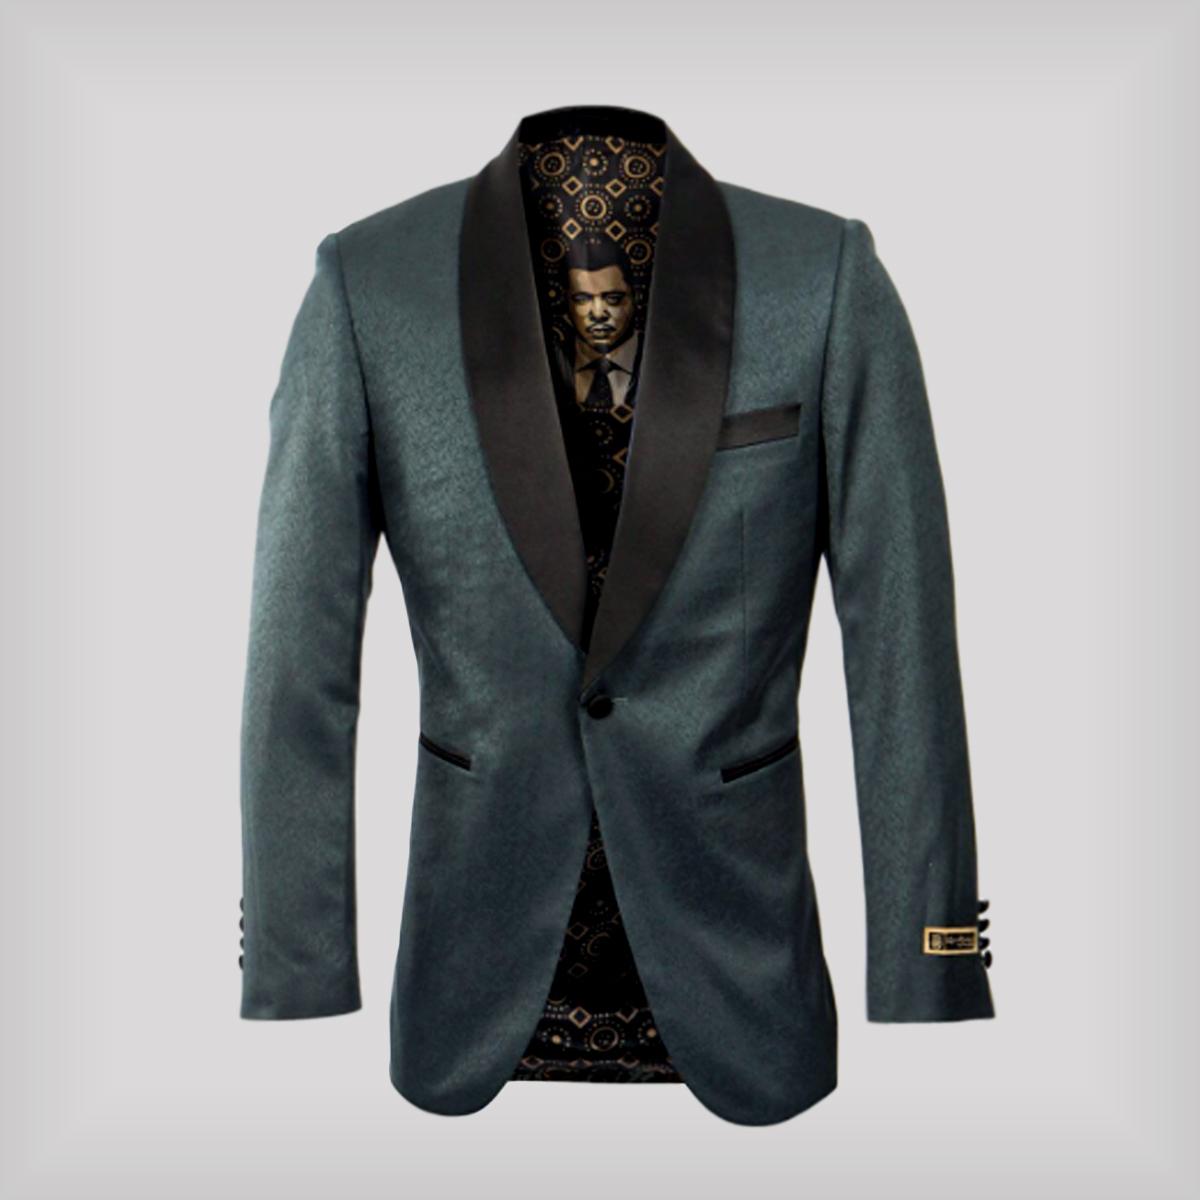 green purchase tuxedo jacket